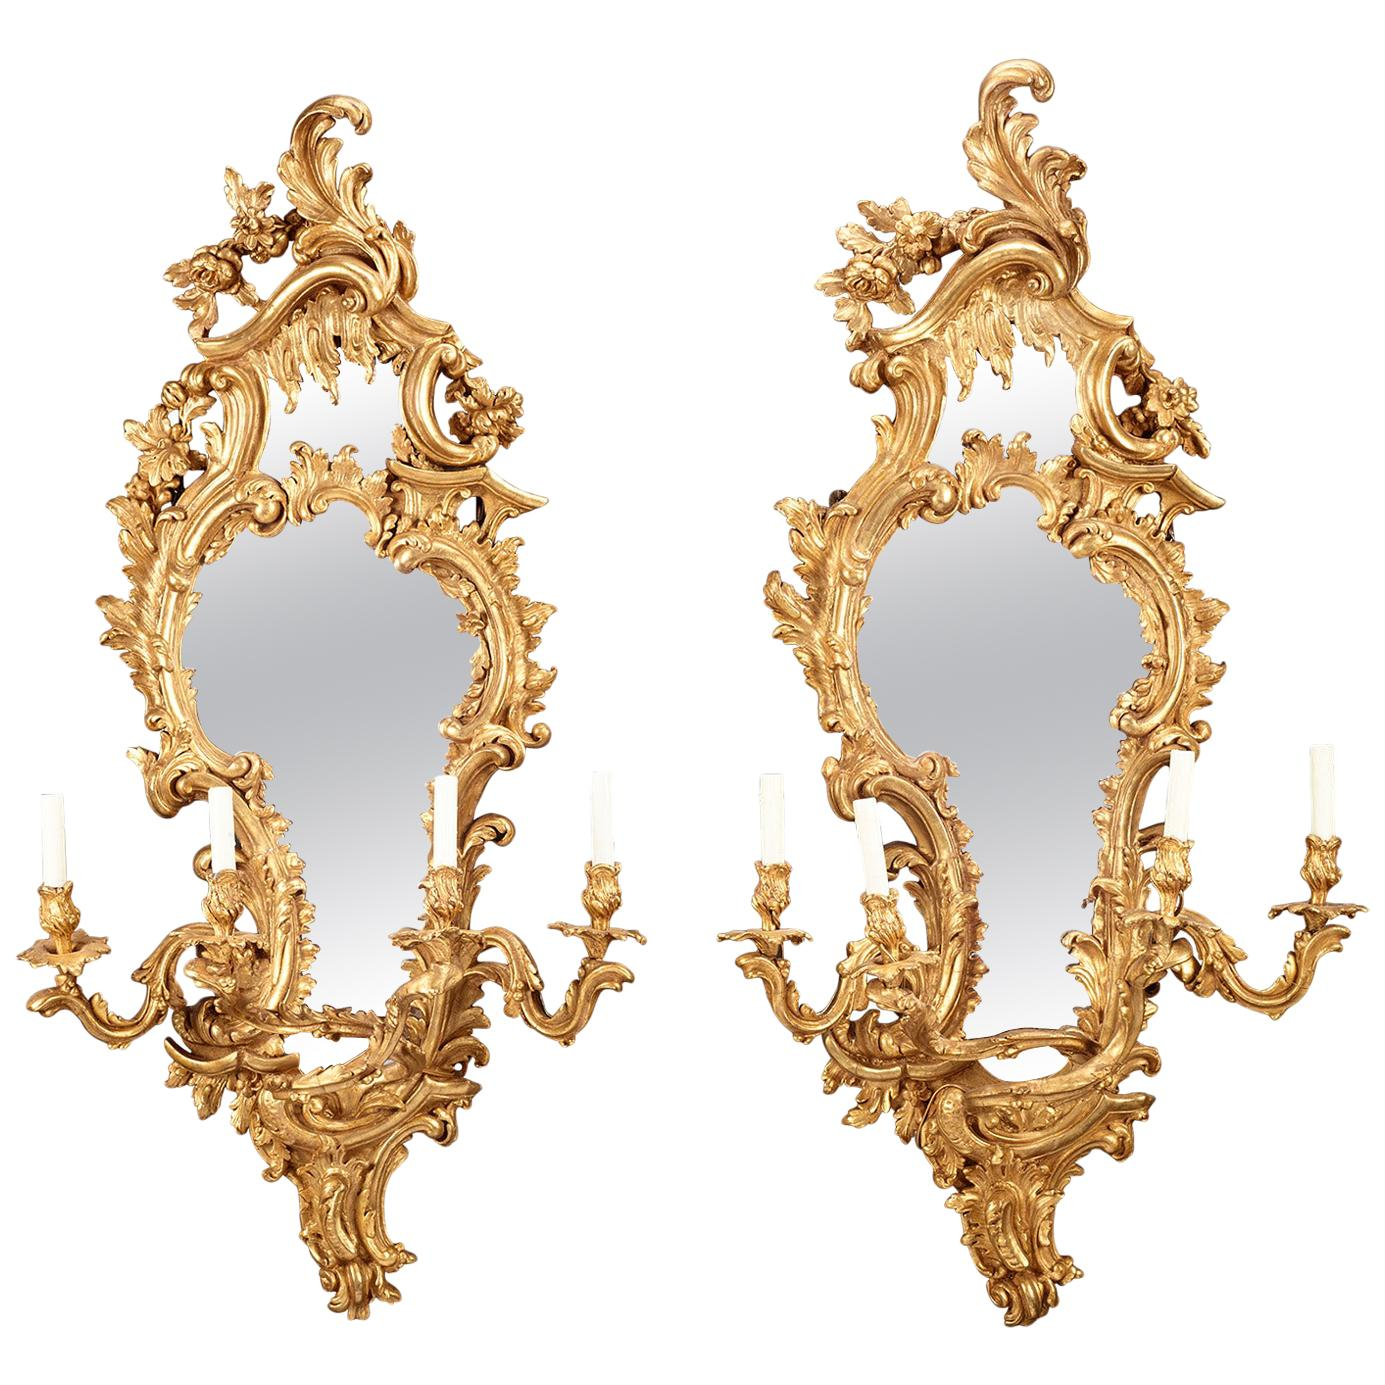 Louis XV Giltwood Mirrored Girandoles